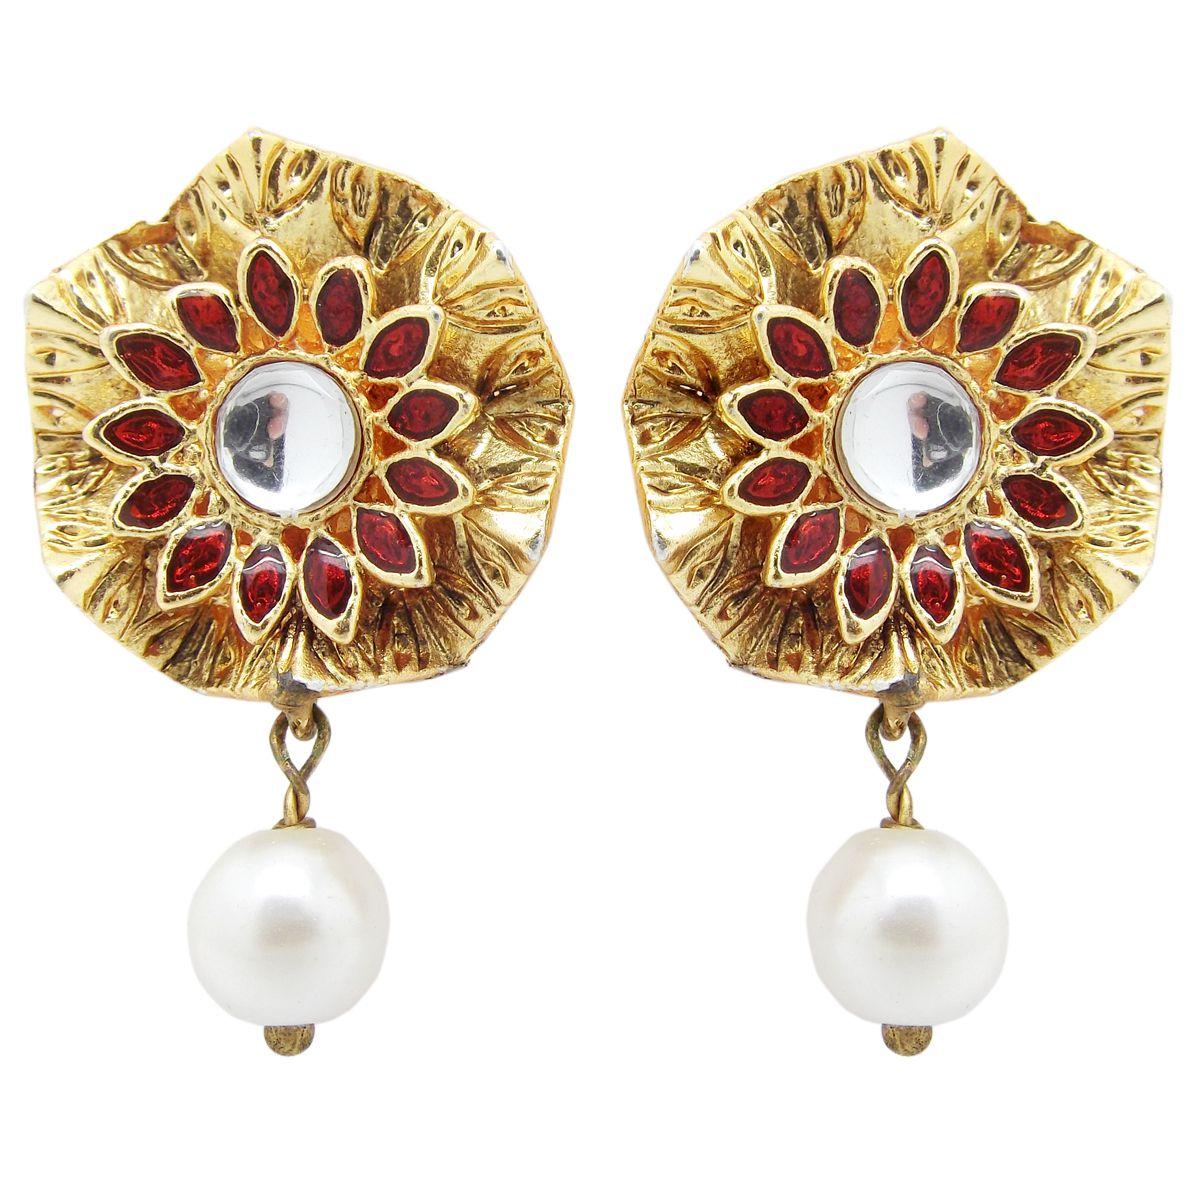 Biyu Delicate Kundan Meenakari Gold Plated Studs Earrings